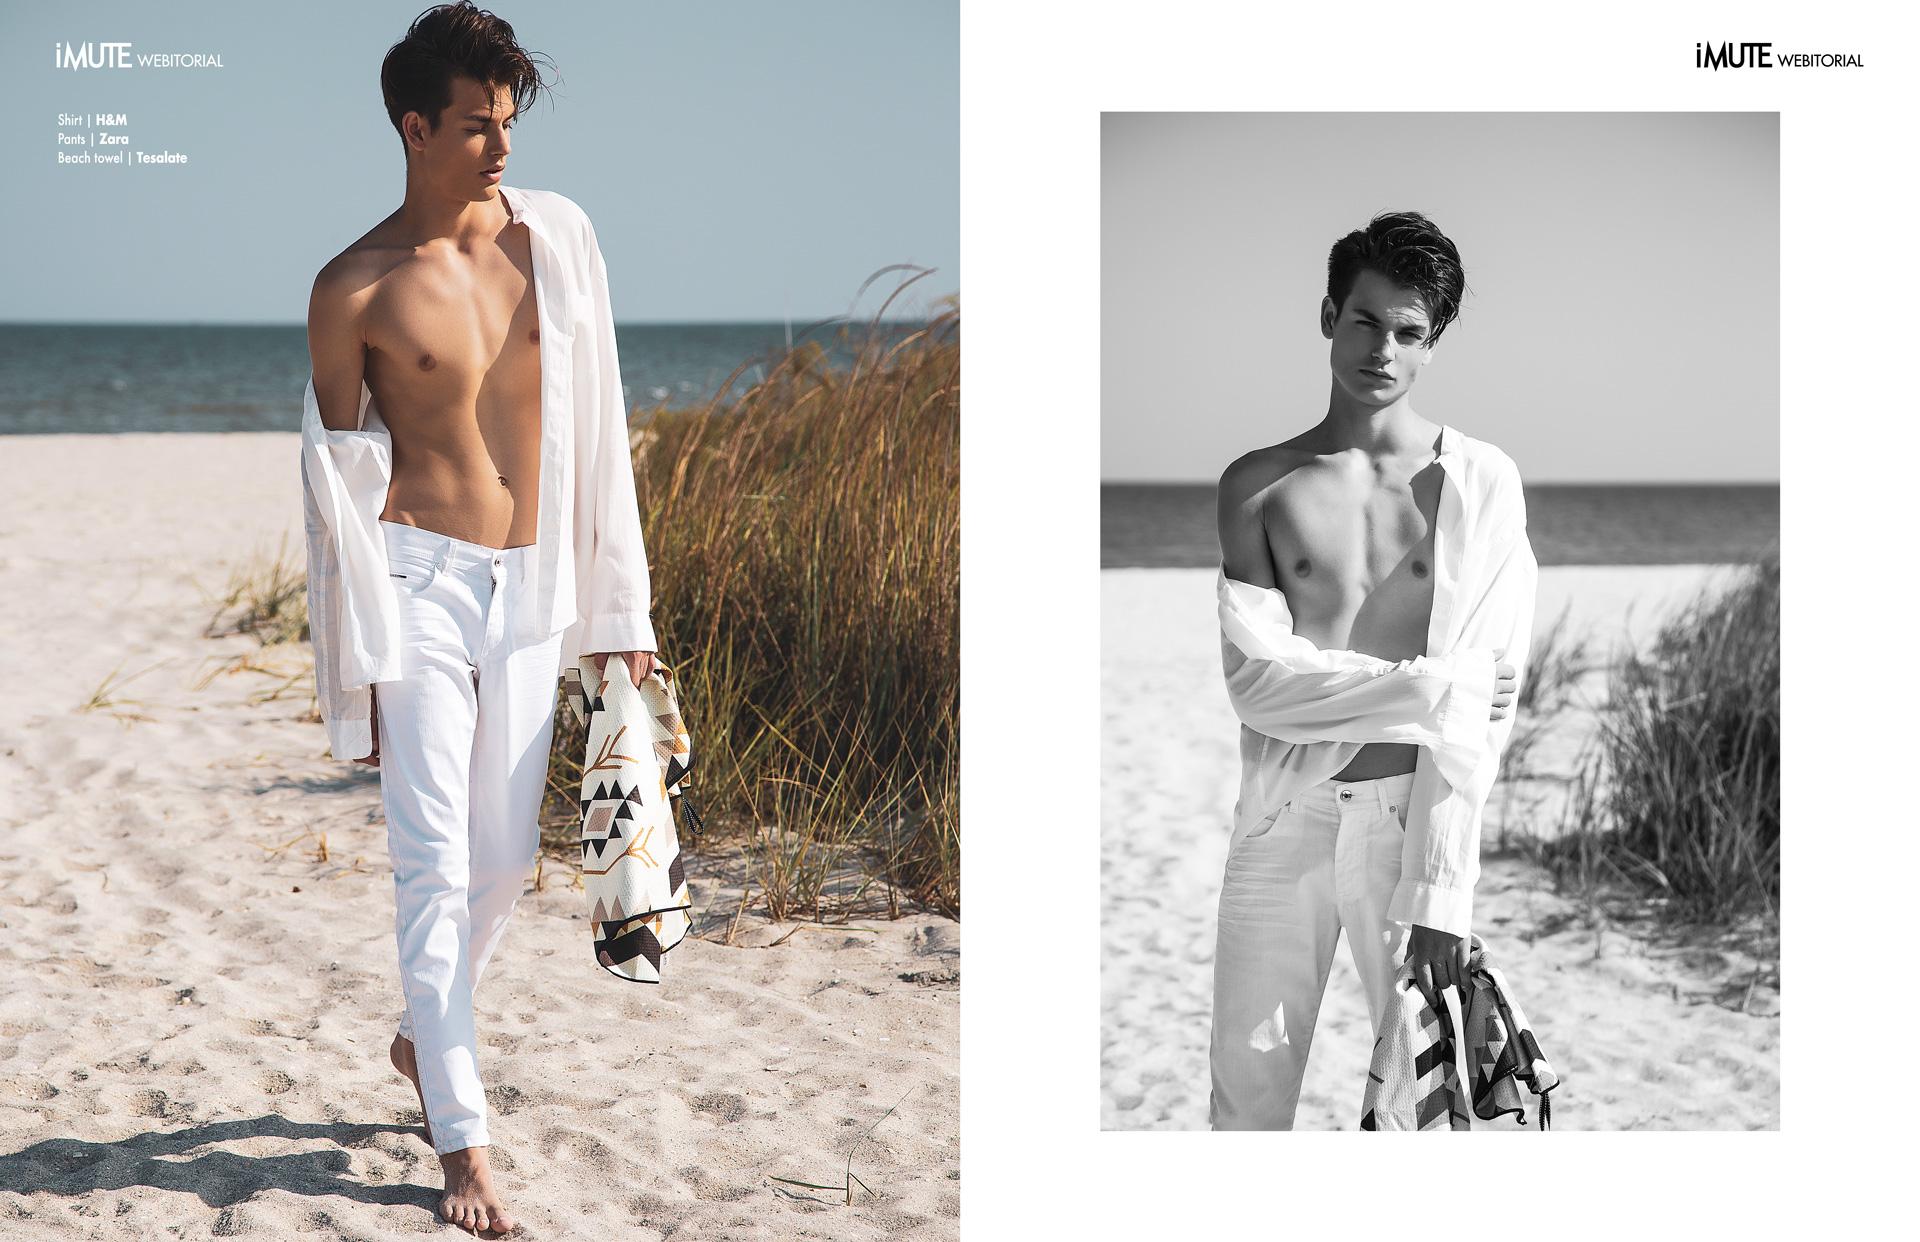 Quicksand webitorial for iMute Magazine Photographer Ionut Cojocaru Model  Vlad @MRA Models Stylist Alina Ababei Makeup Ioana Popa Production MRA Production